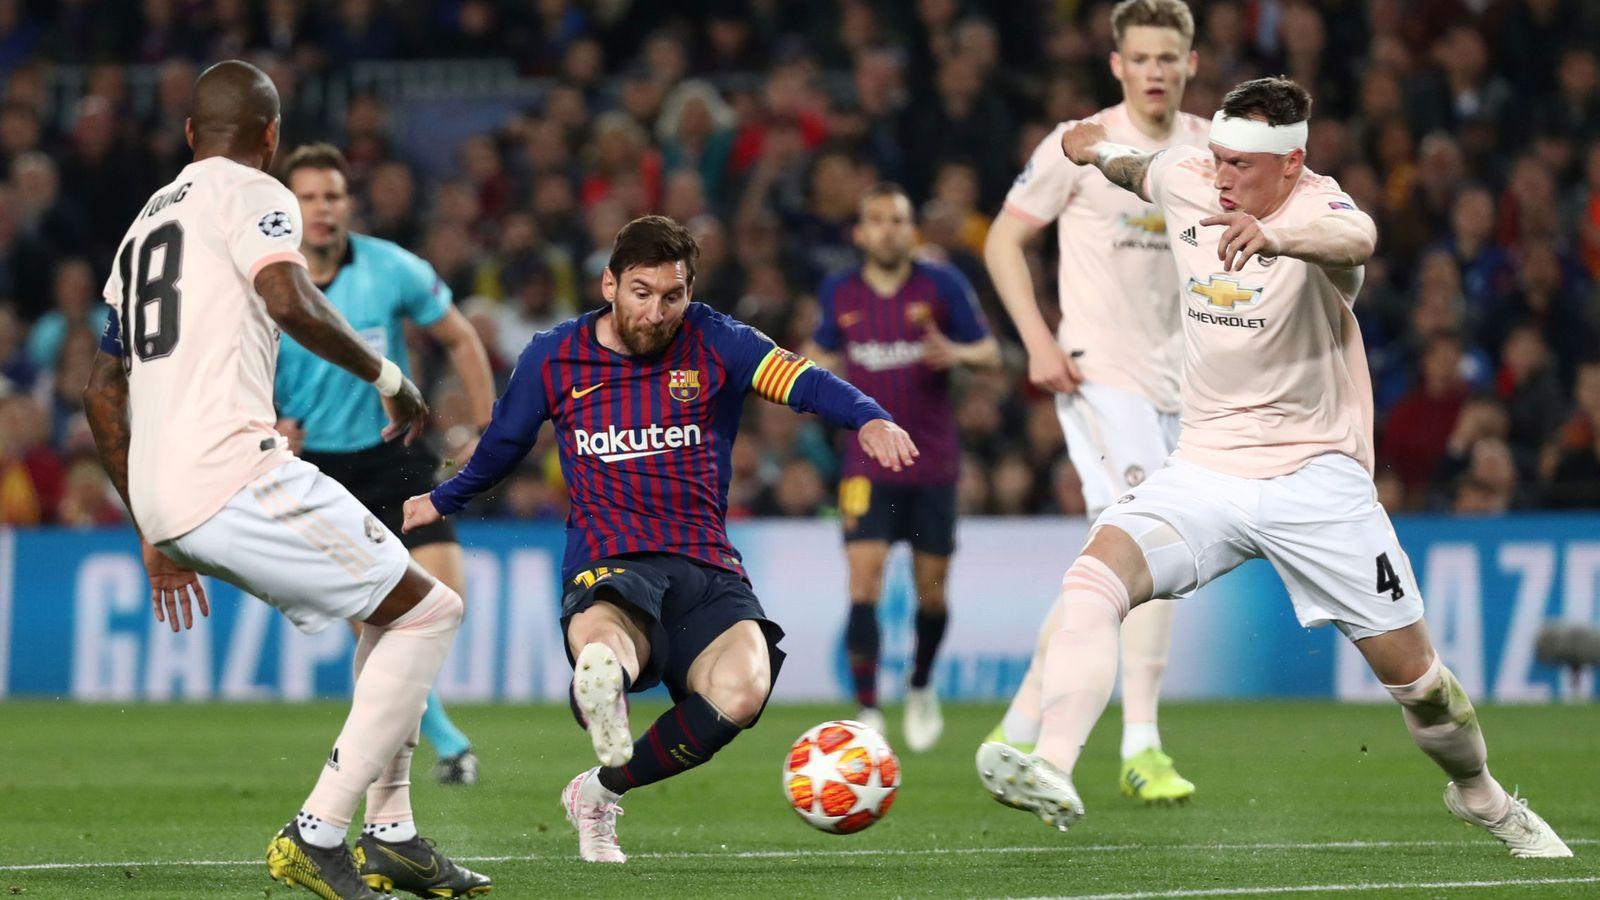 Foto: Champions league quarter final second leg - fc barcelona v manchester united